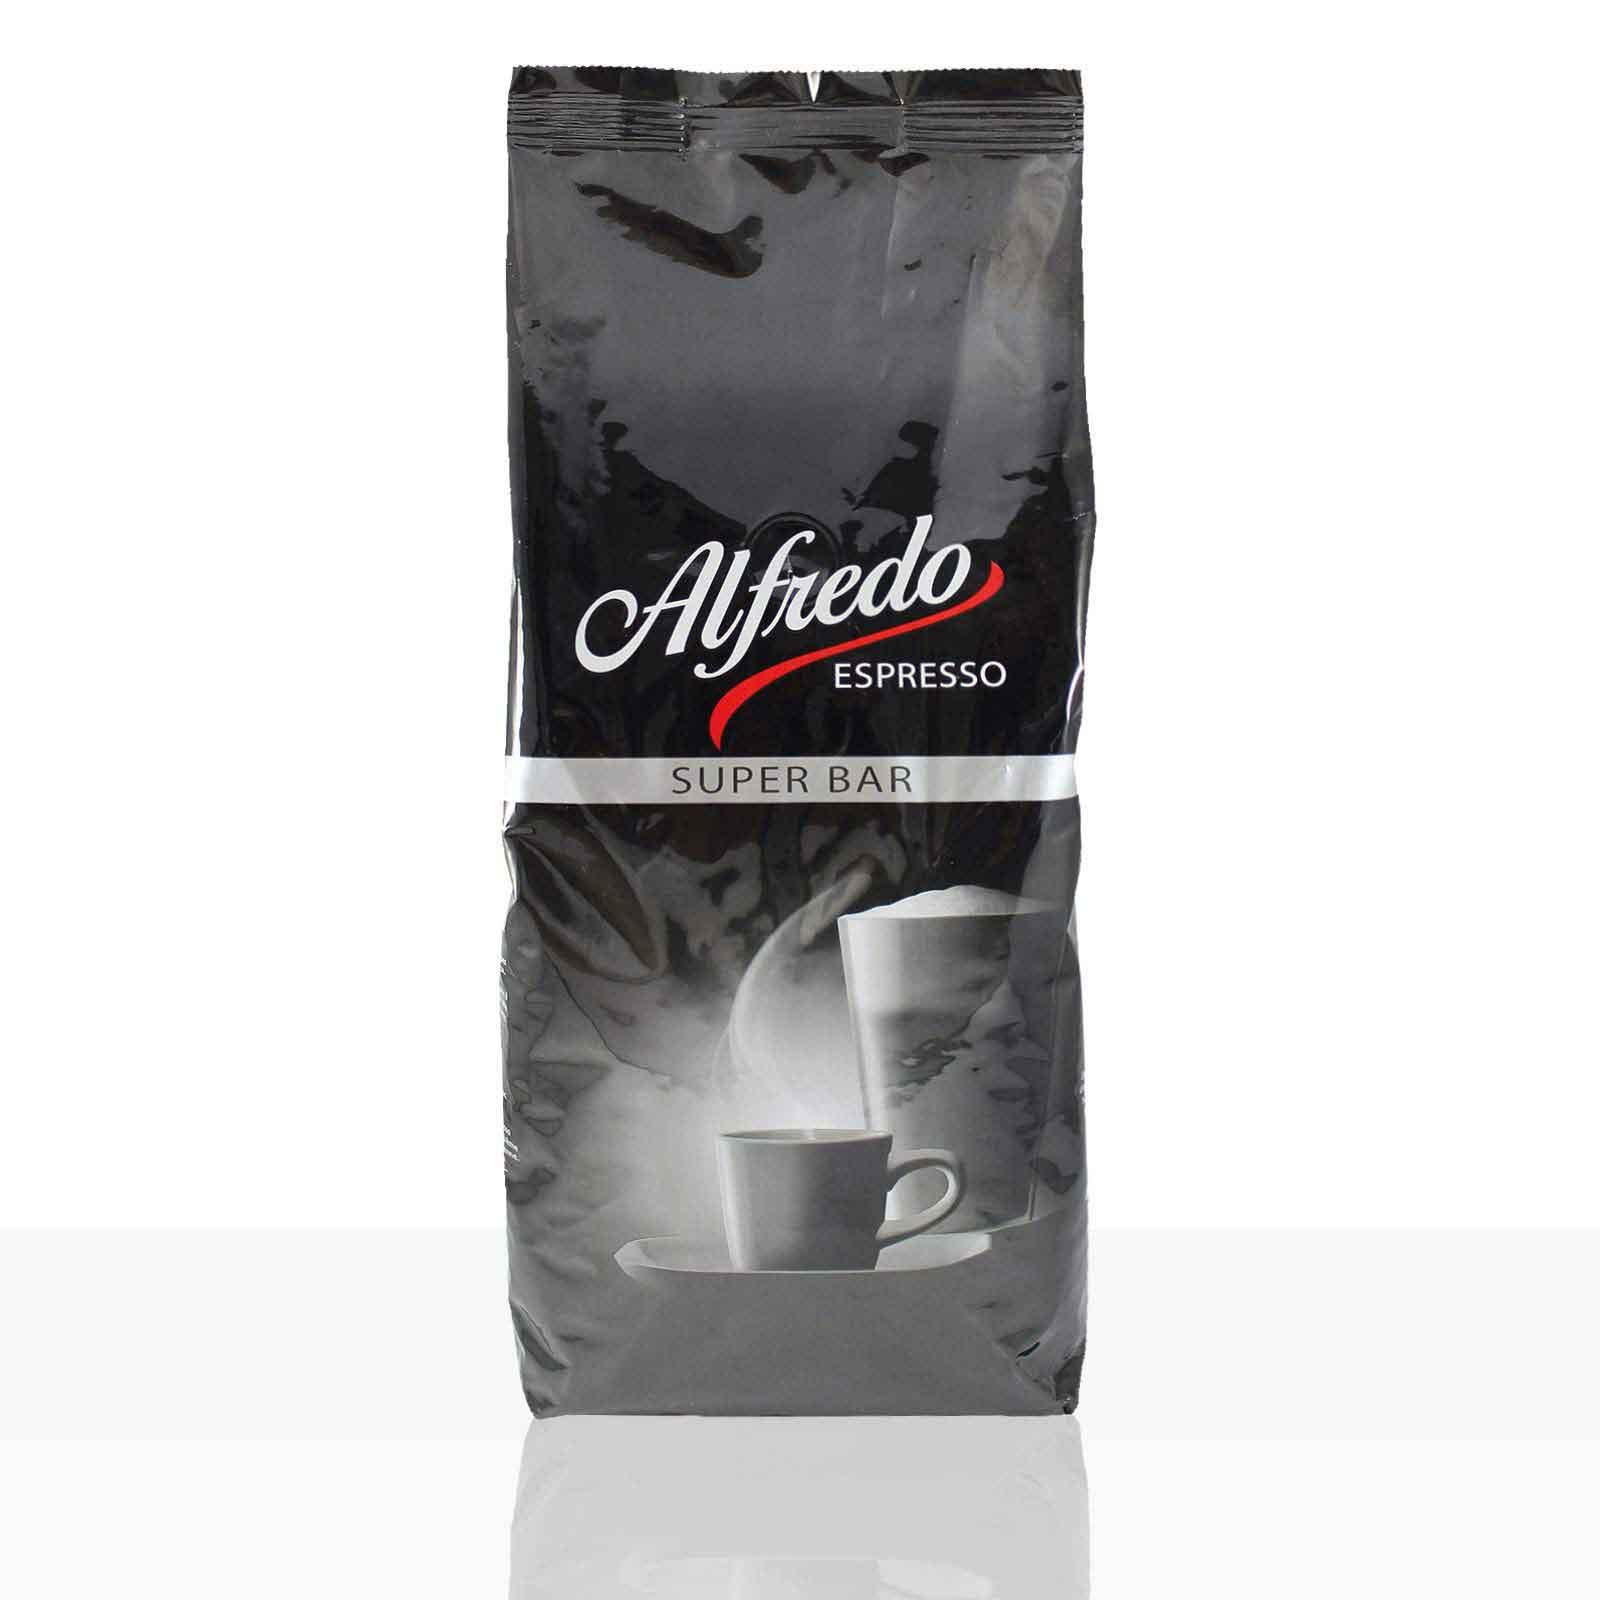 Darboven Alfredo Espresso Super Bar - 1kg Kaffee-Bohnen